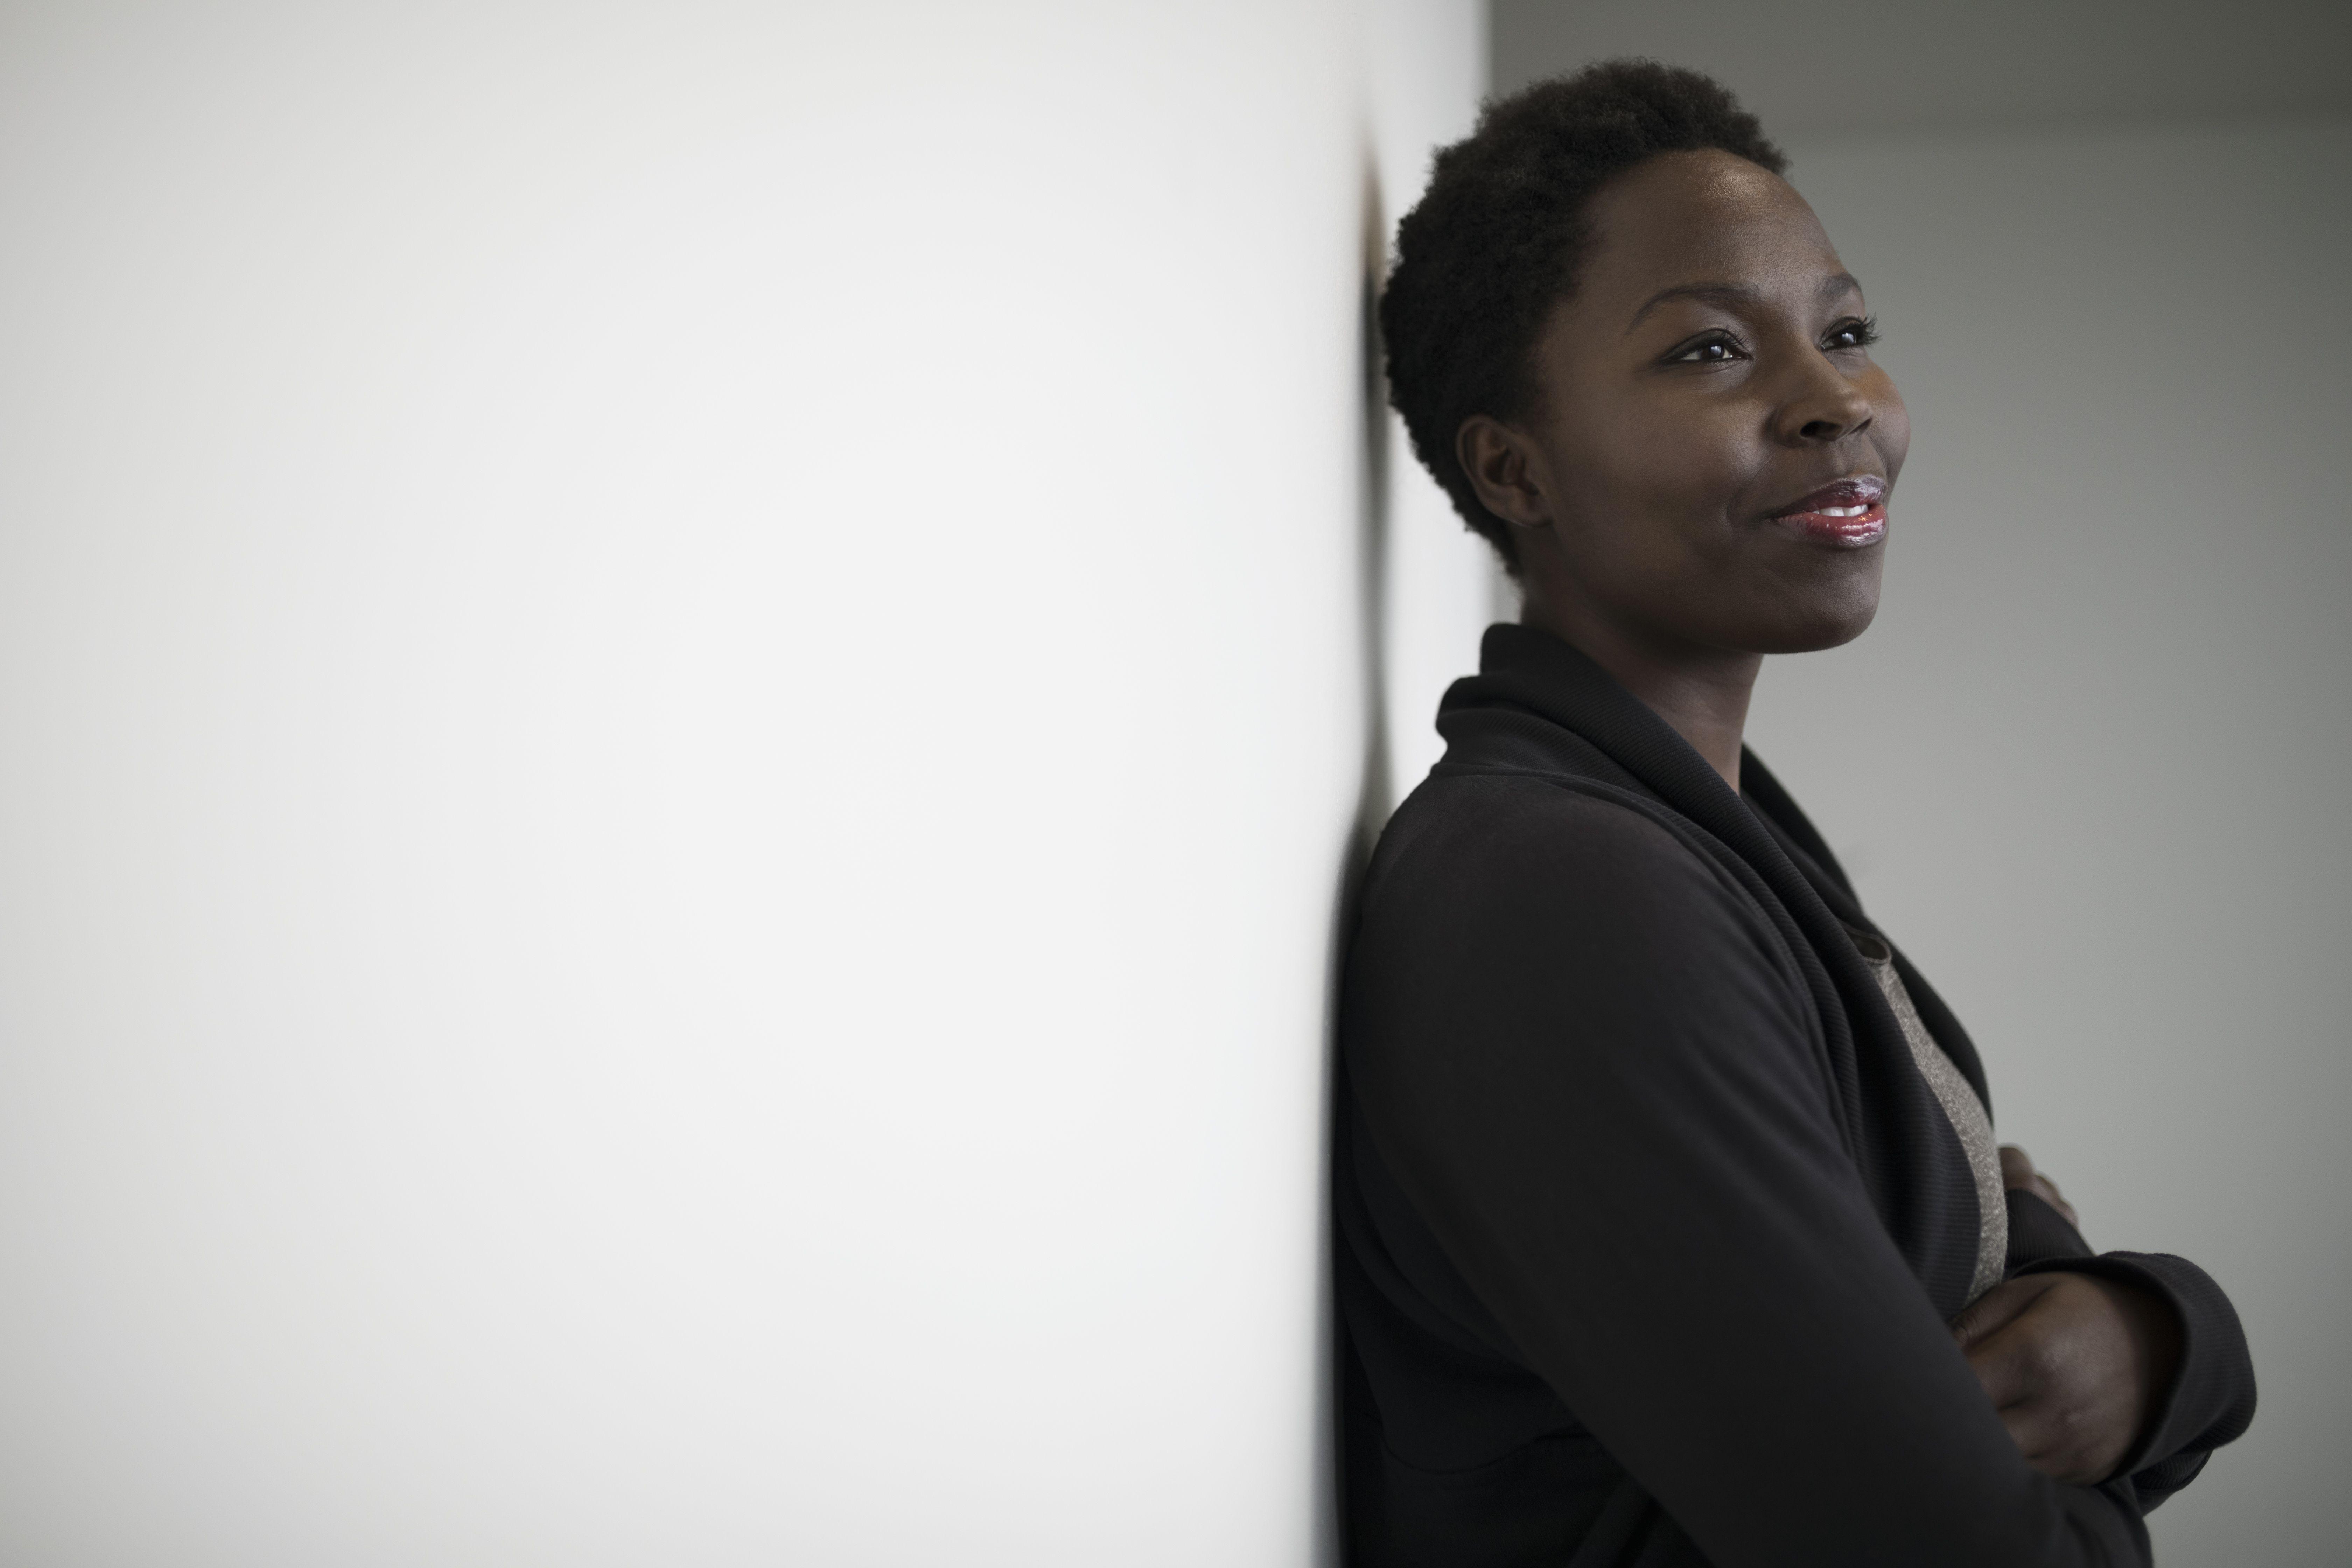 Portrait confident, ambitious, forward looking woman